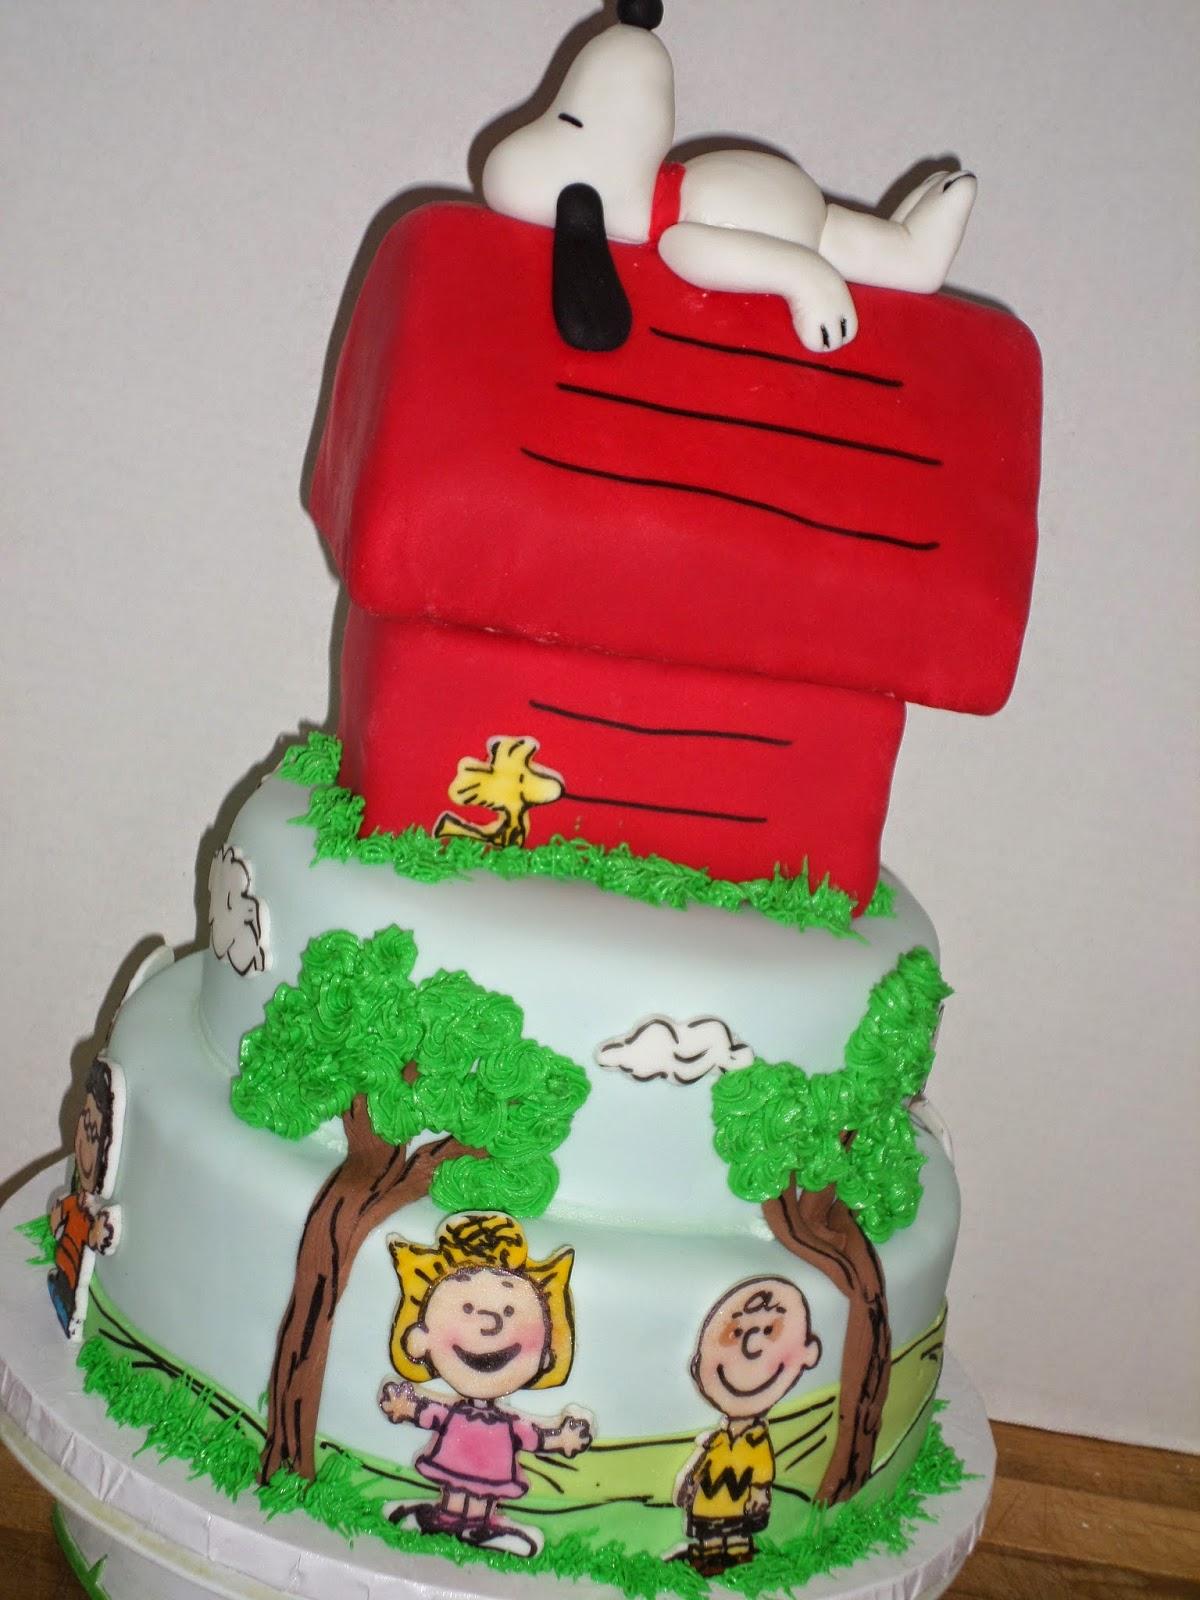 Snoopy Peanuts Birthday Cake Ideas And Designs